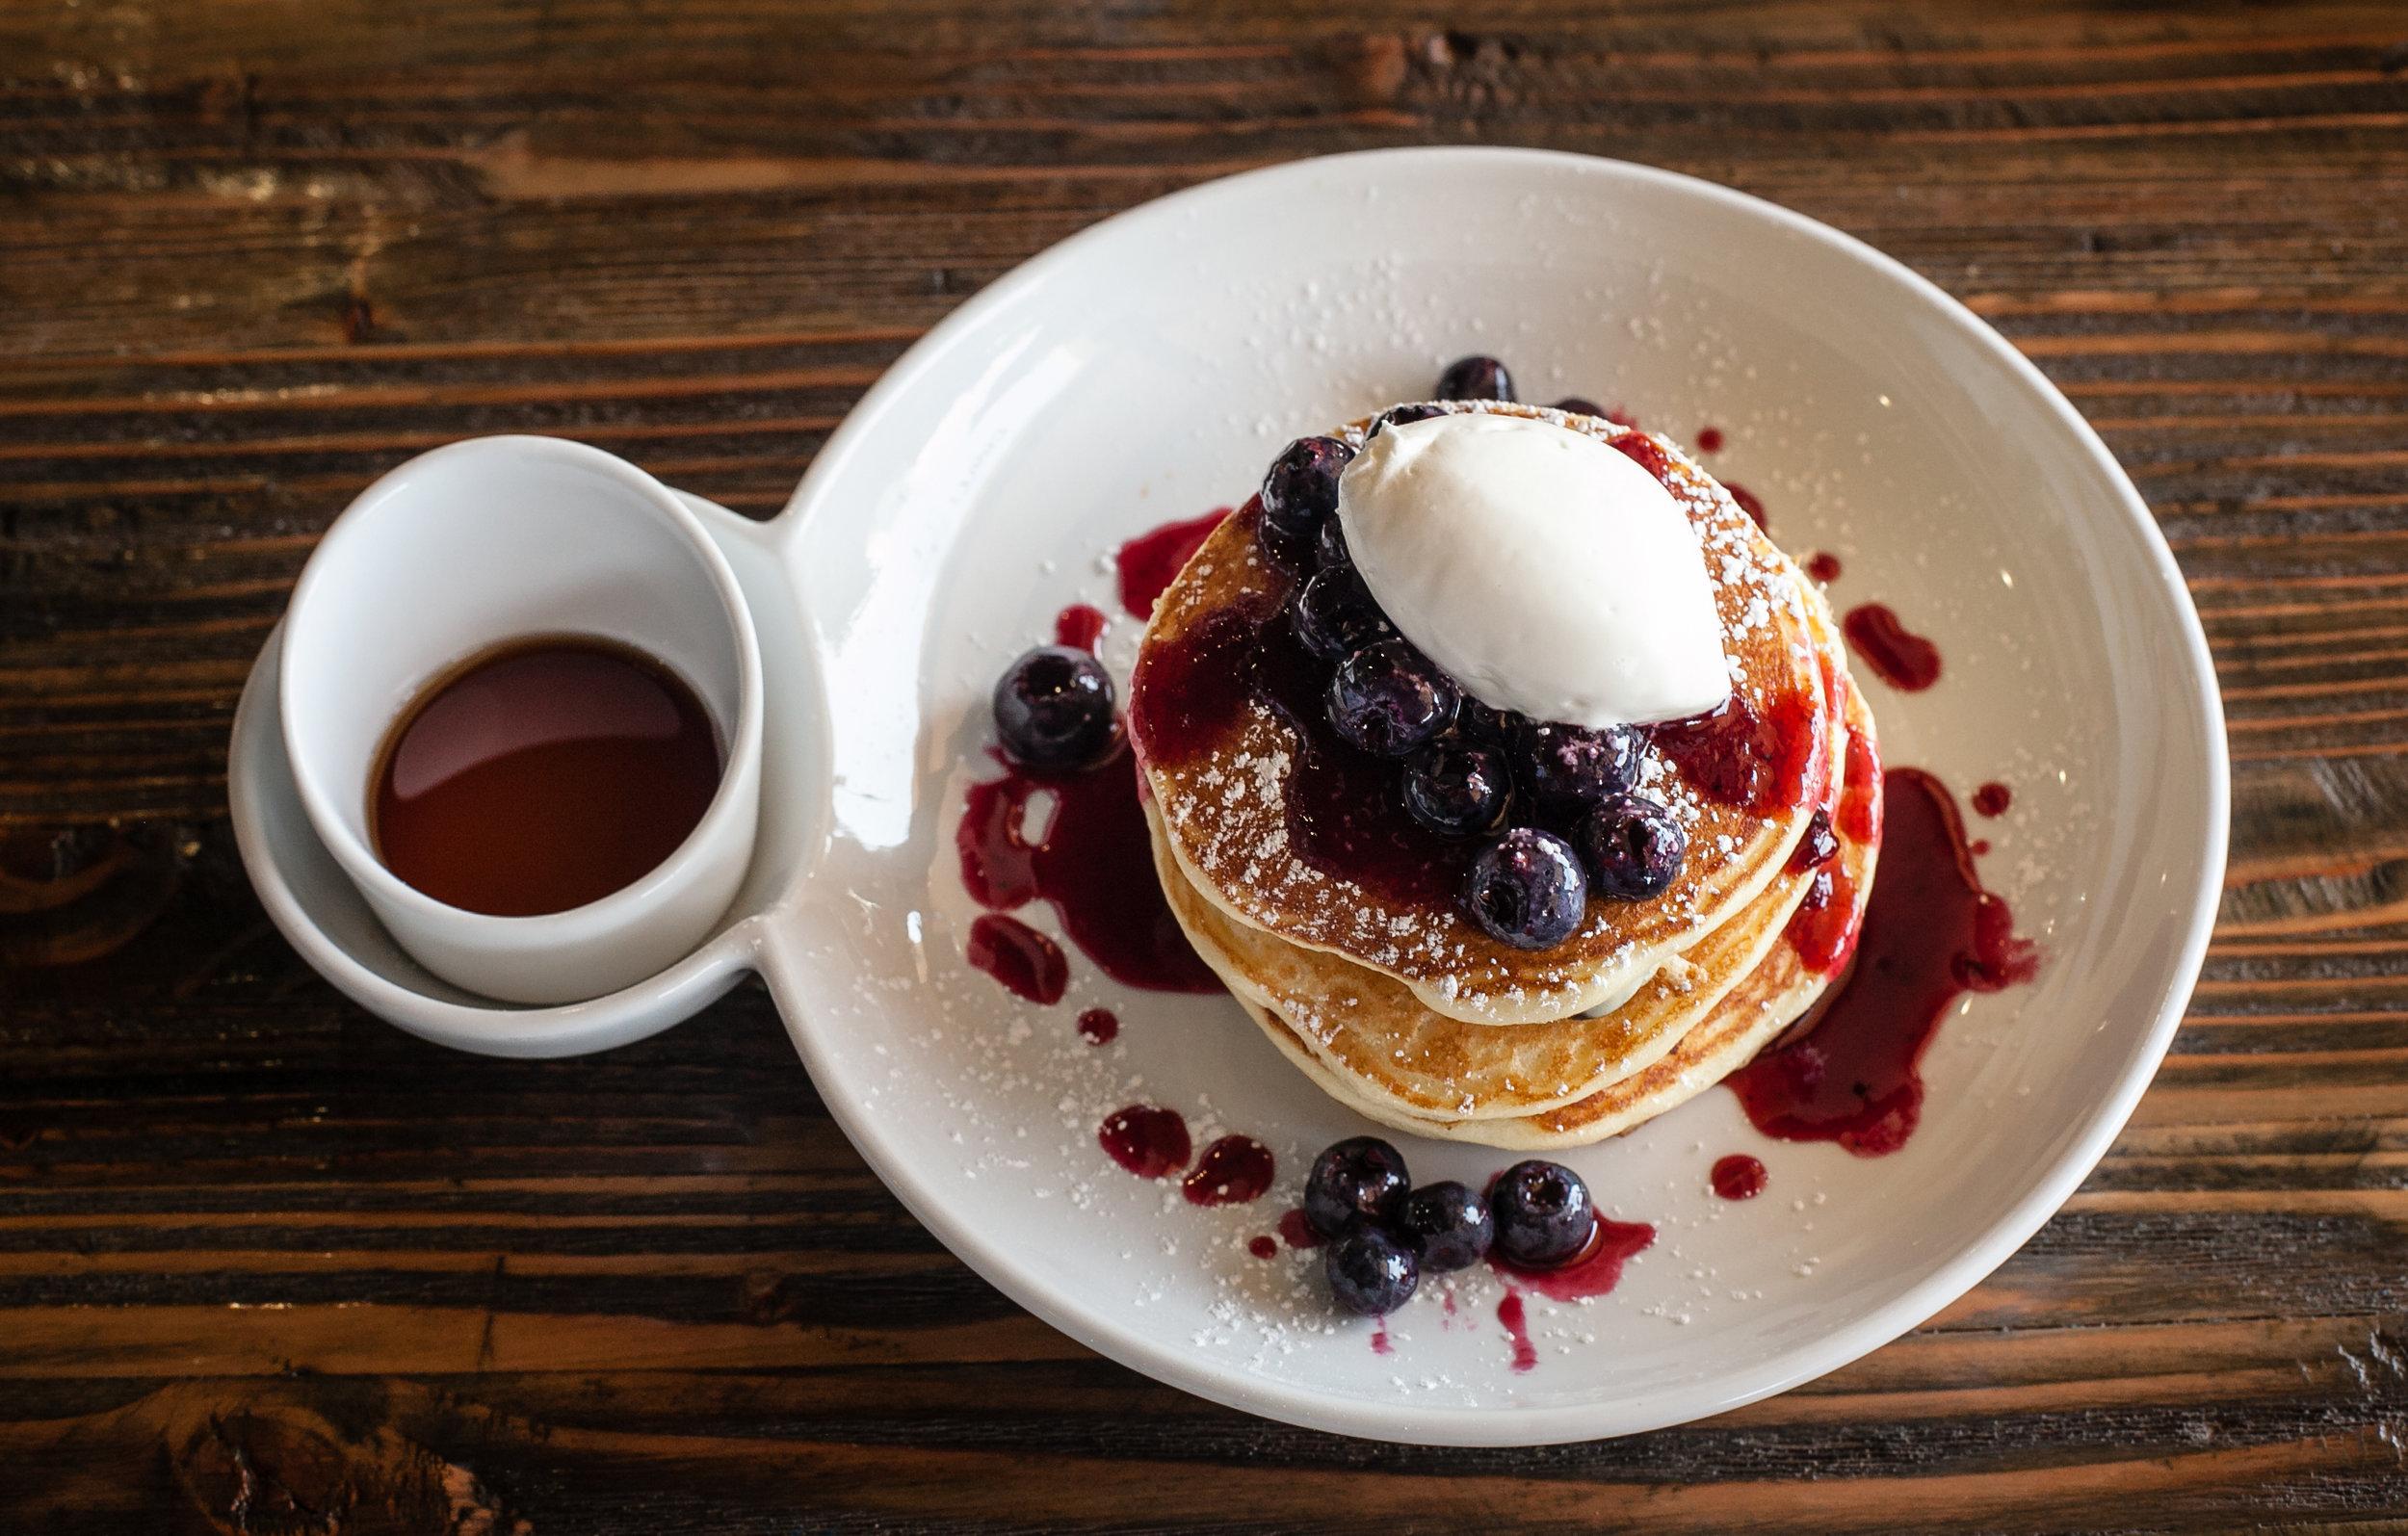 CRAFTkitchen Las Vegas Blueberry Pancakes.jpg